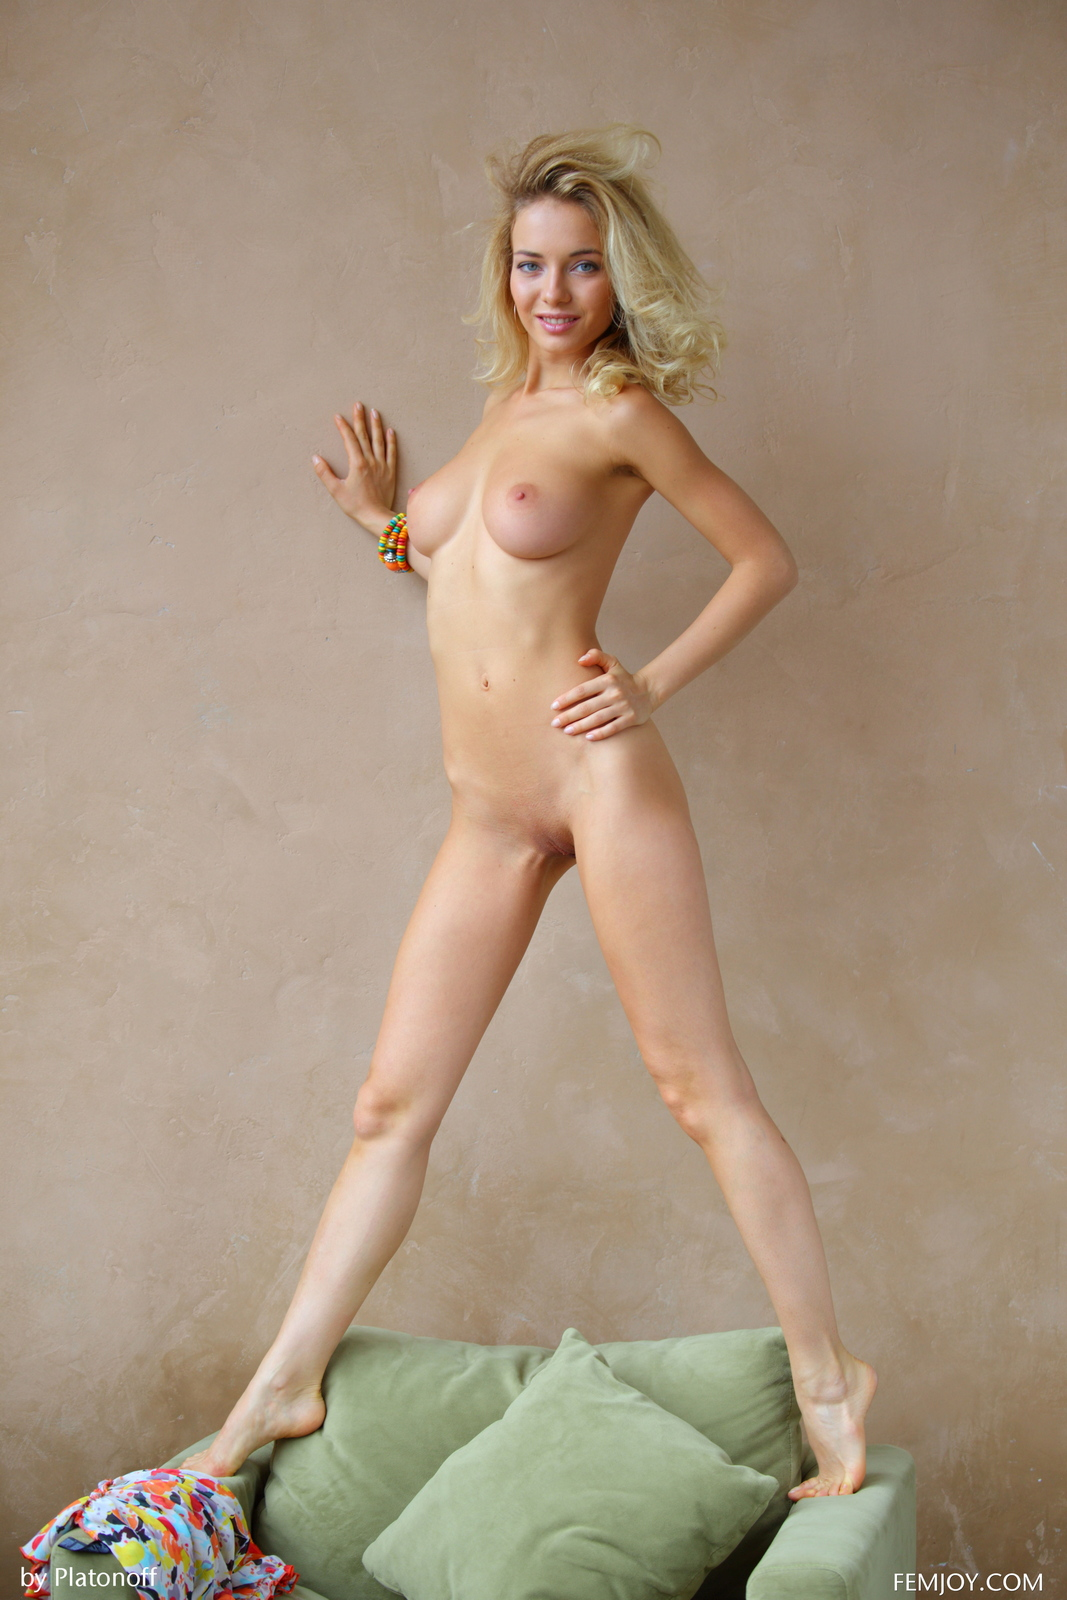 annabell-boobs-blonde-green-armchair-nude-femjoy-19